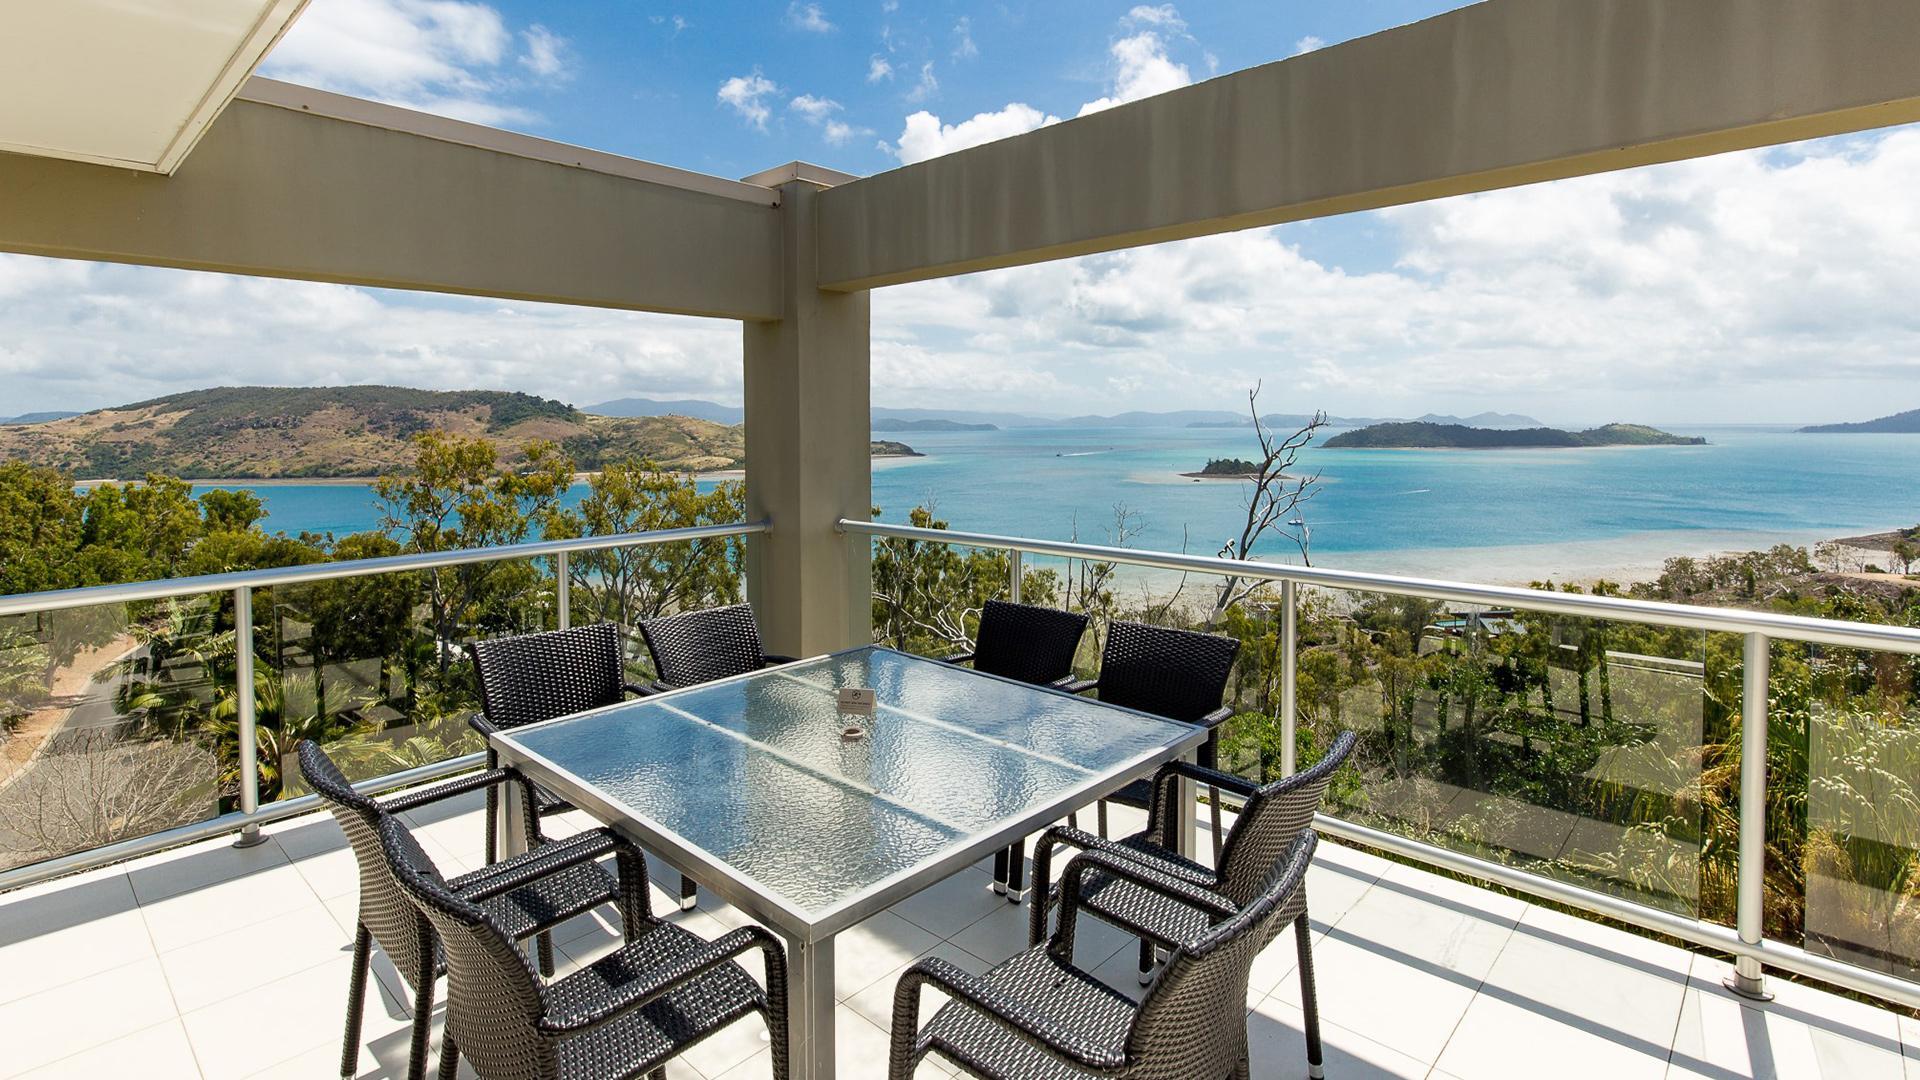 Skiathos Villa image 1 at Skiathos on Hamilton Island by Whitsunday Regional, Queensland, Australia